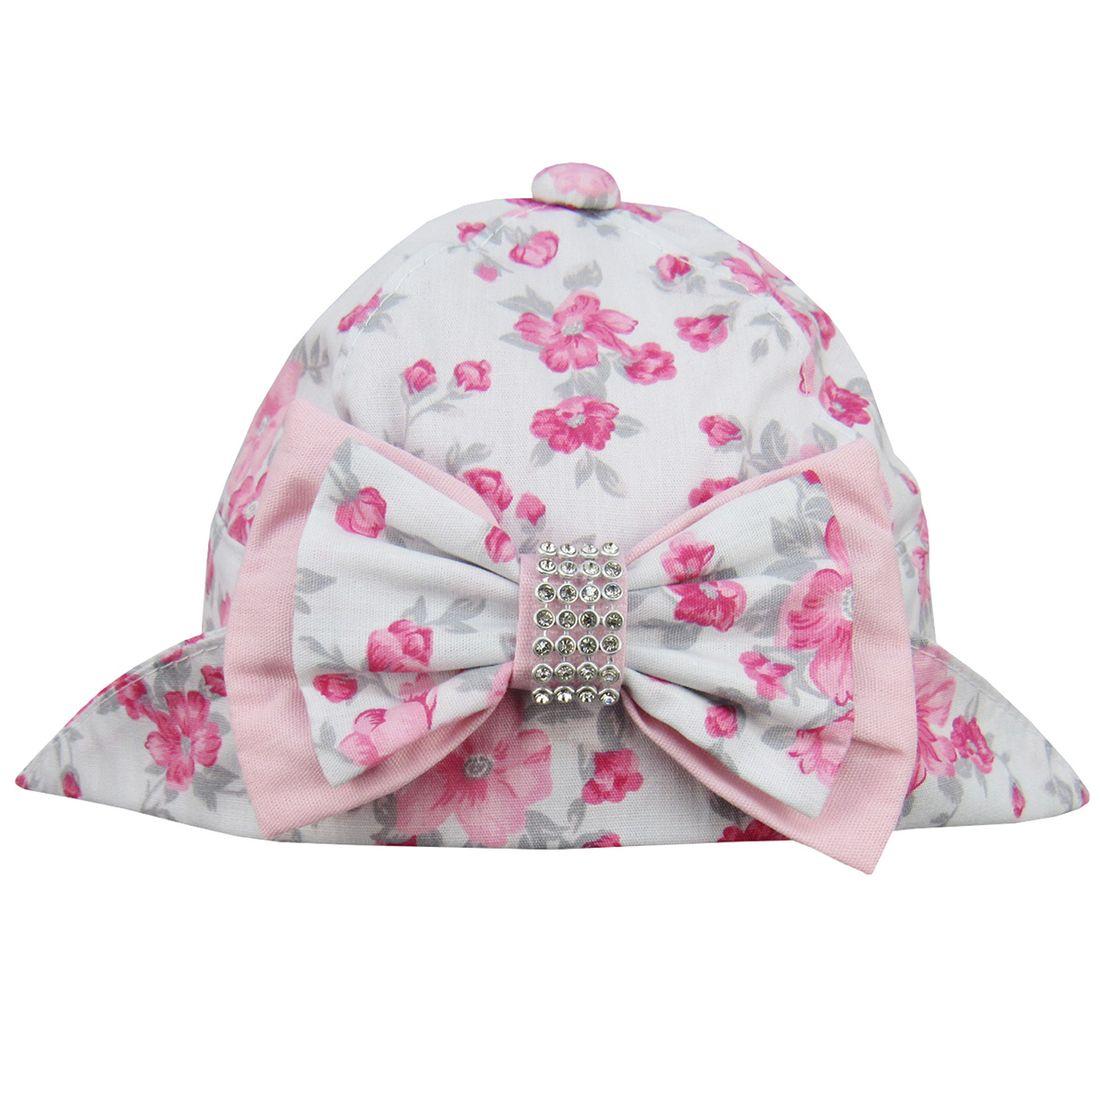 Chapéu Bebê Feminino Branco Floral - 5 à 8 Meses - poetique 2fdeca1b2ca